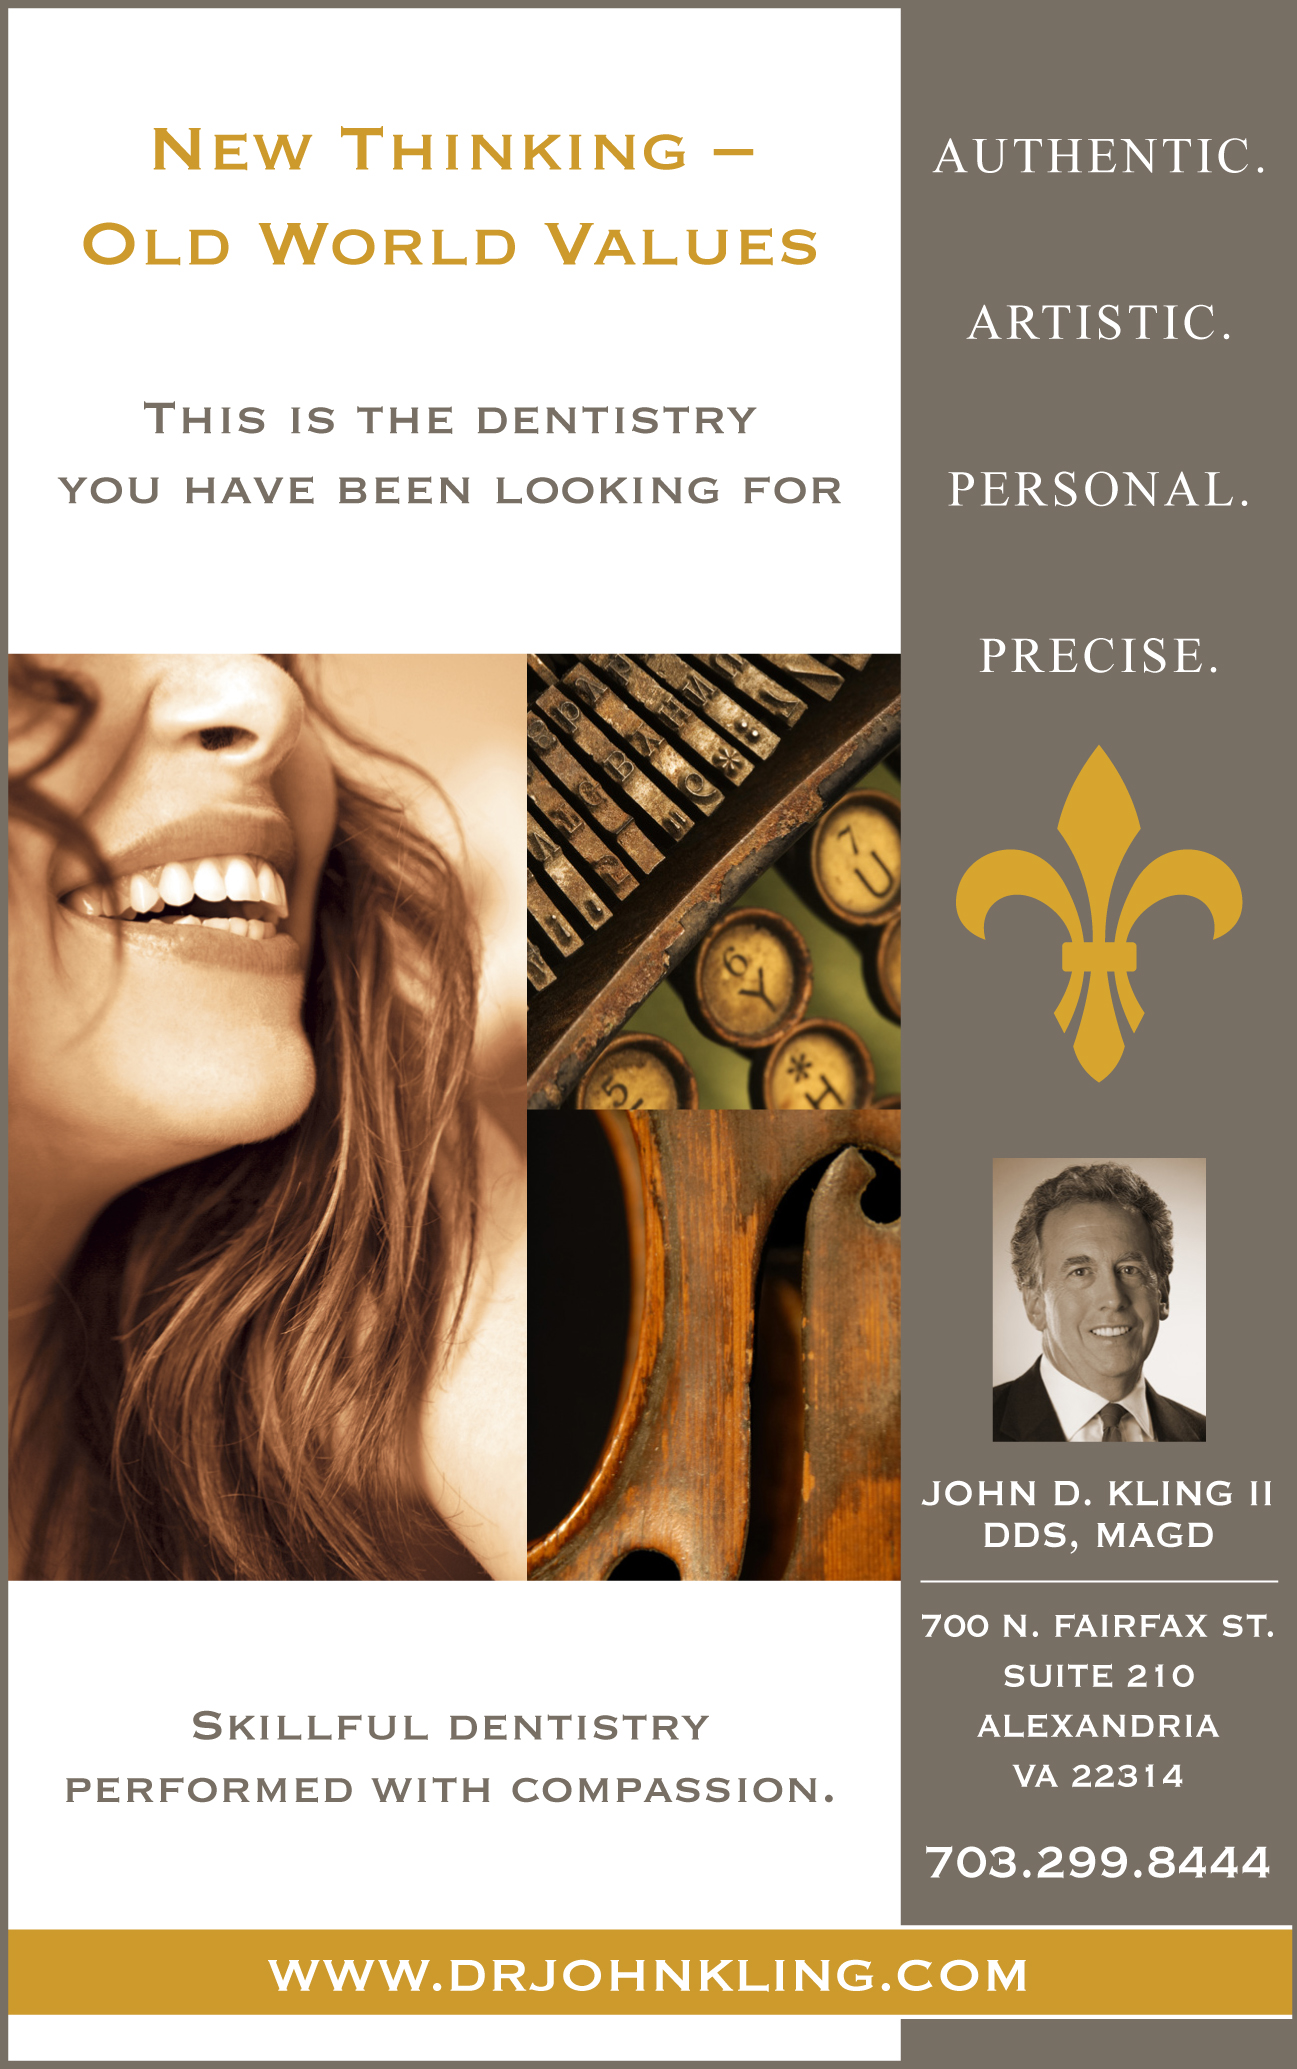 Dental practice branding ad